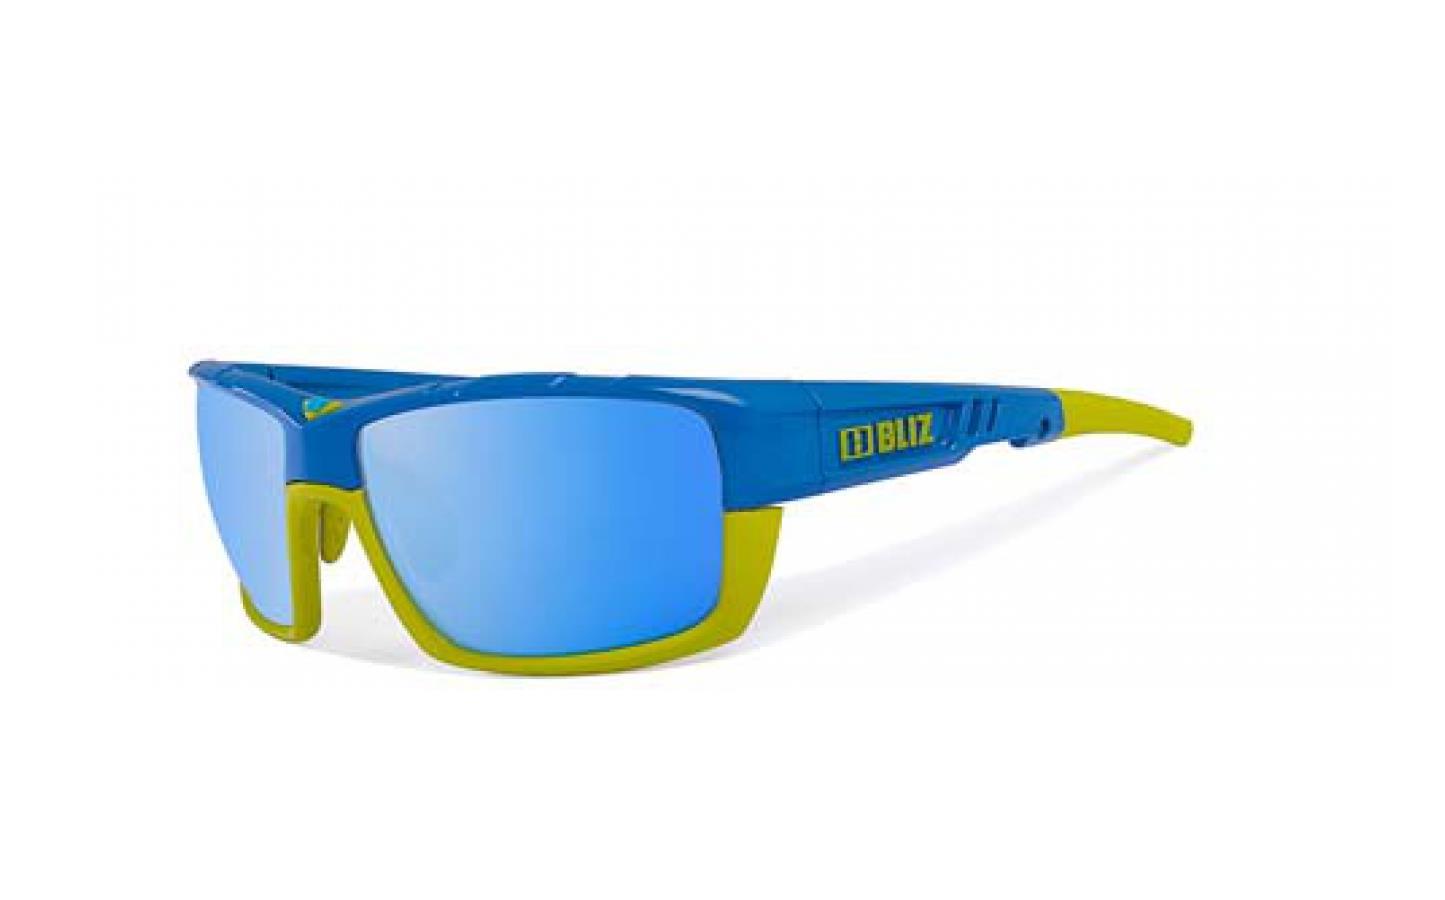 очки кaпли для симс 3